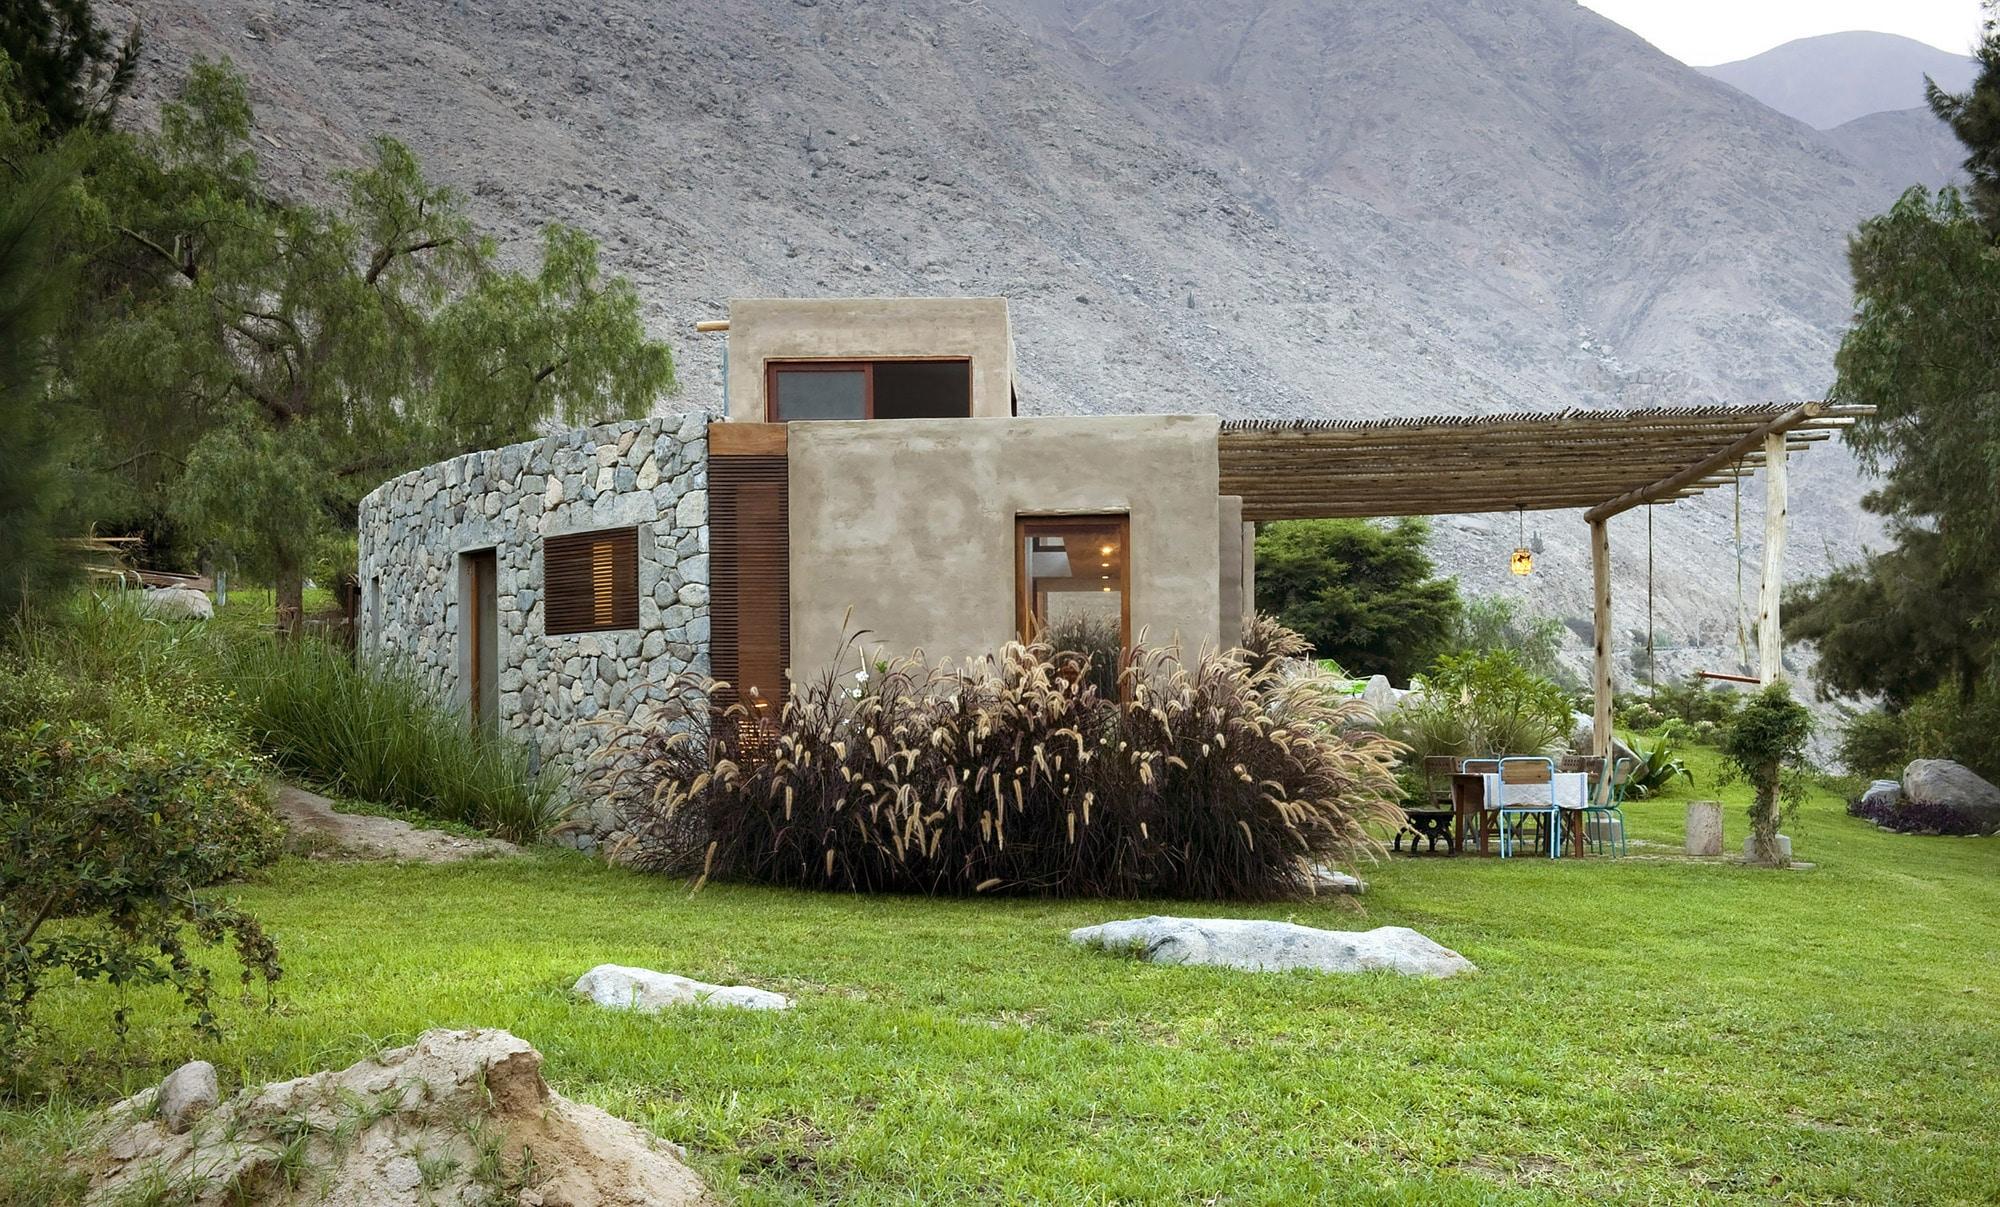 Dise o casa de campo tradicional construye hogar for Planos de casas de campo rusticas